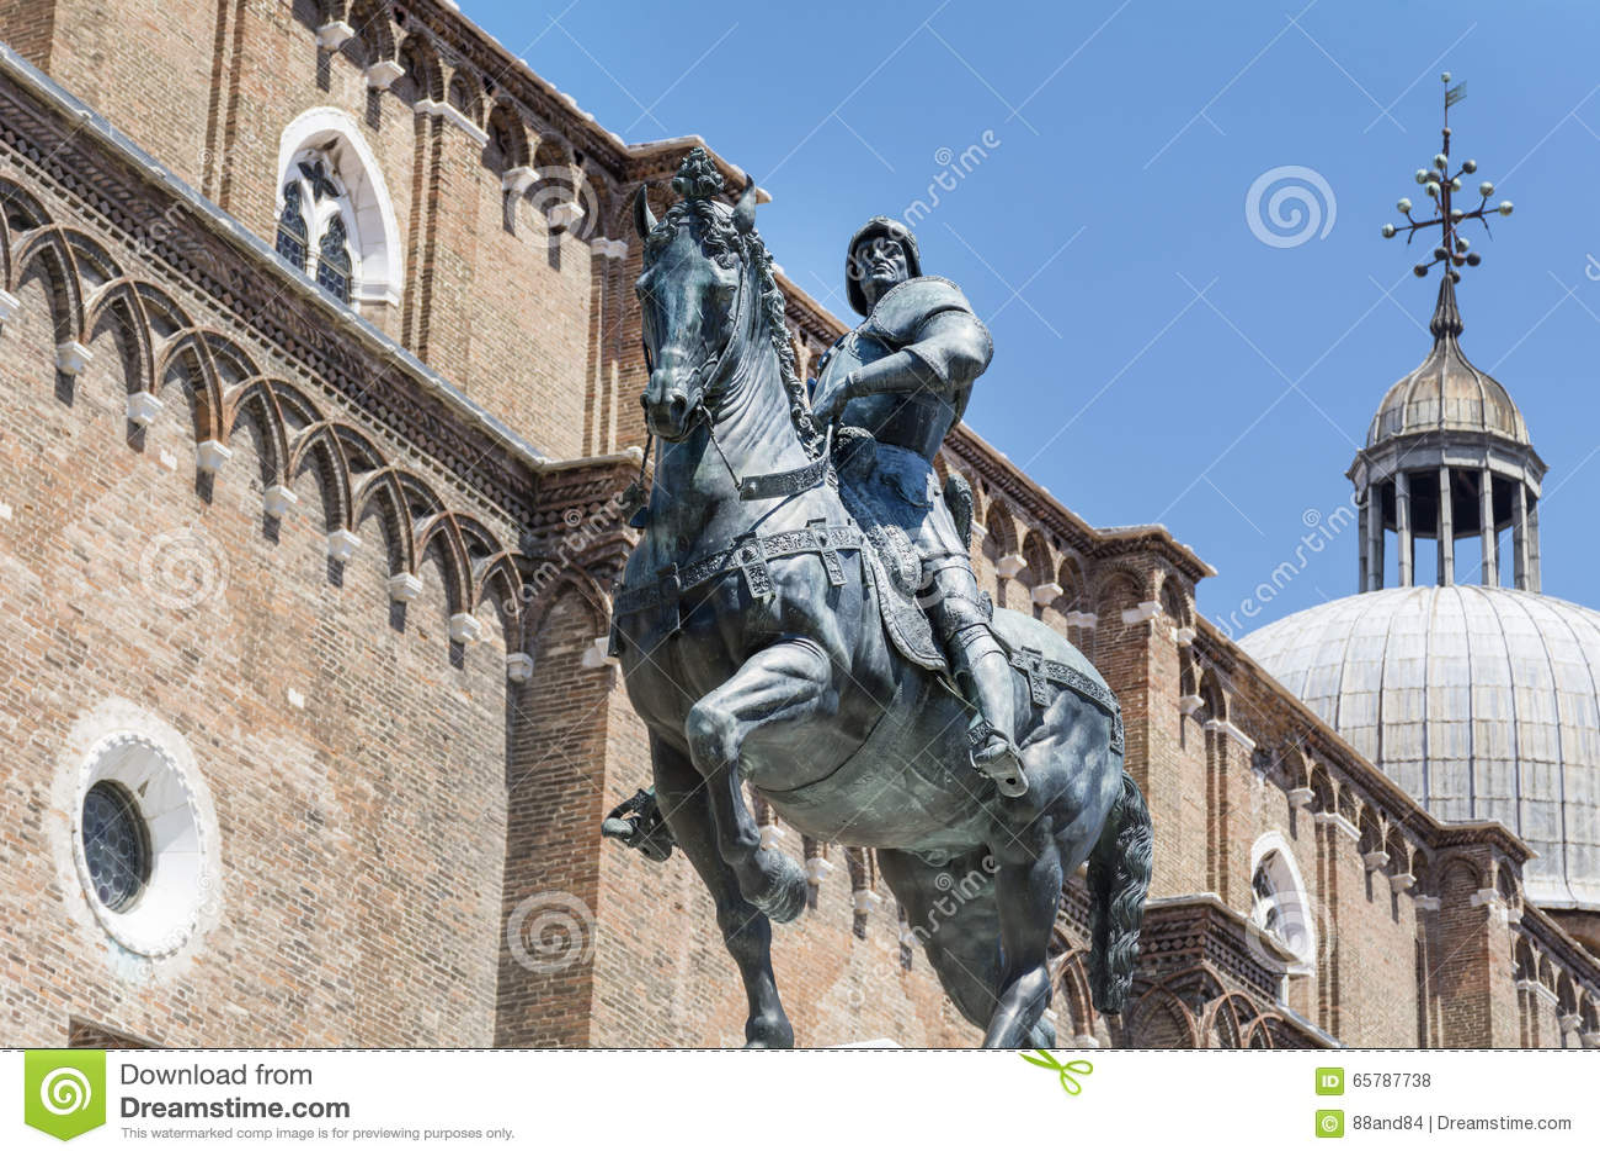 Venice Knight